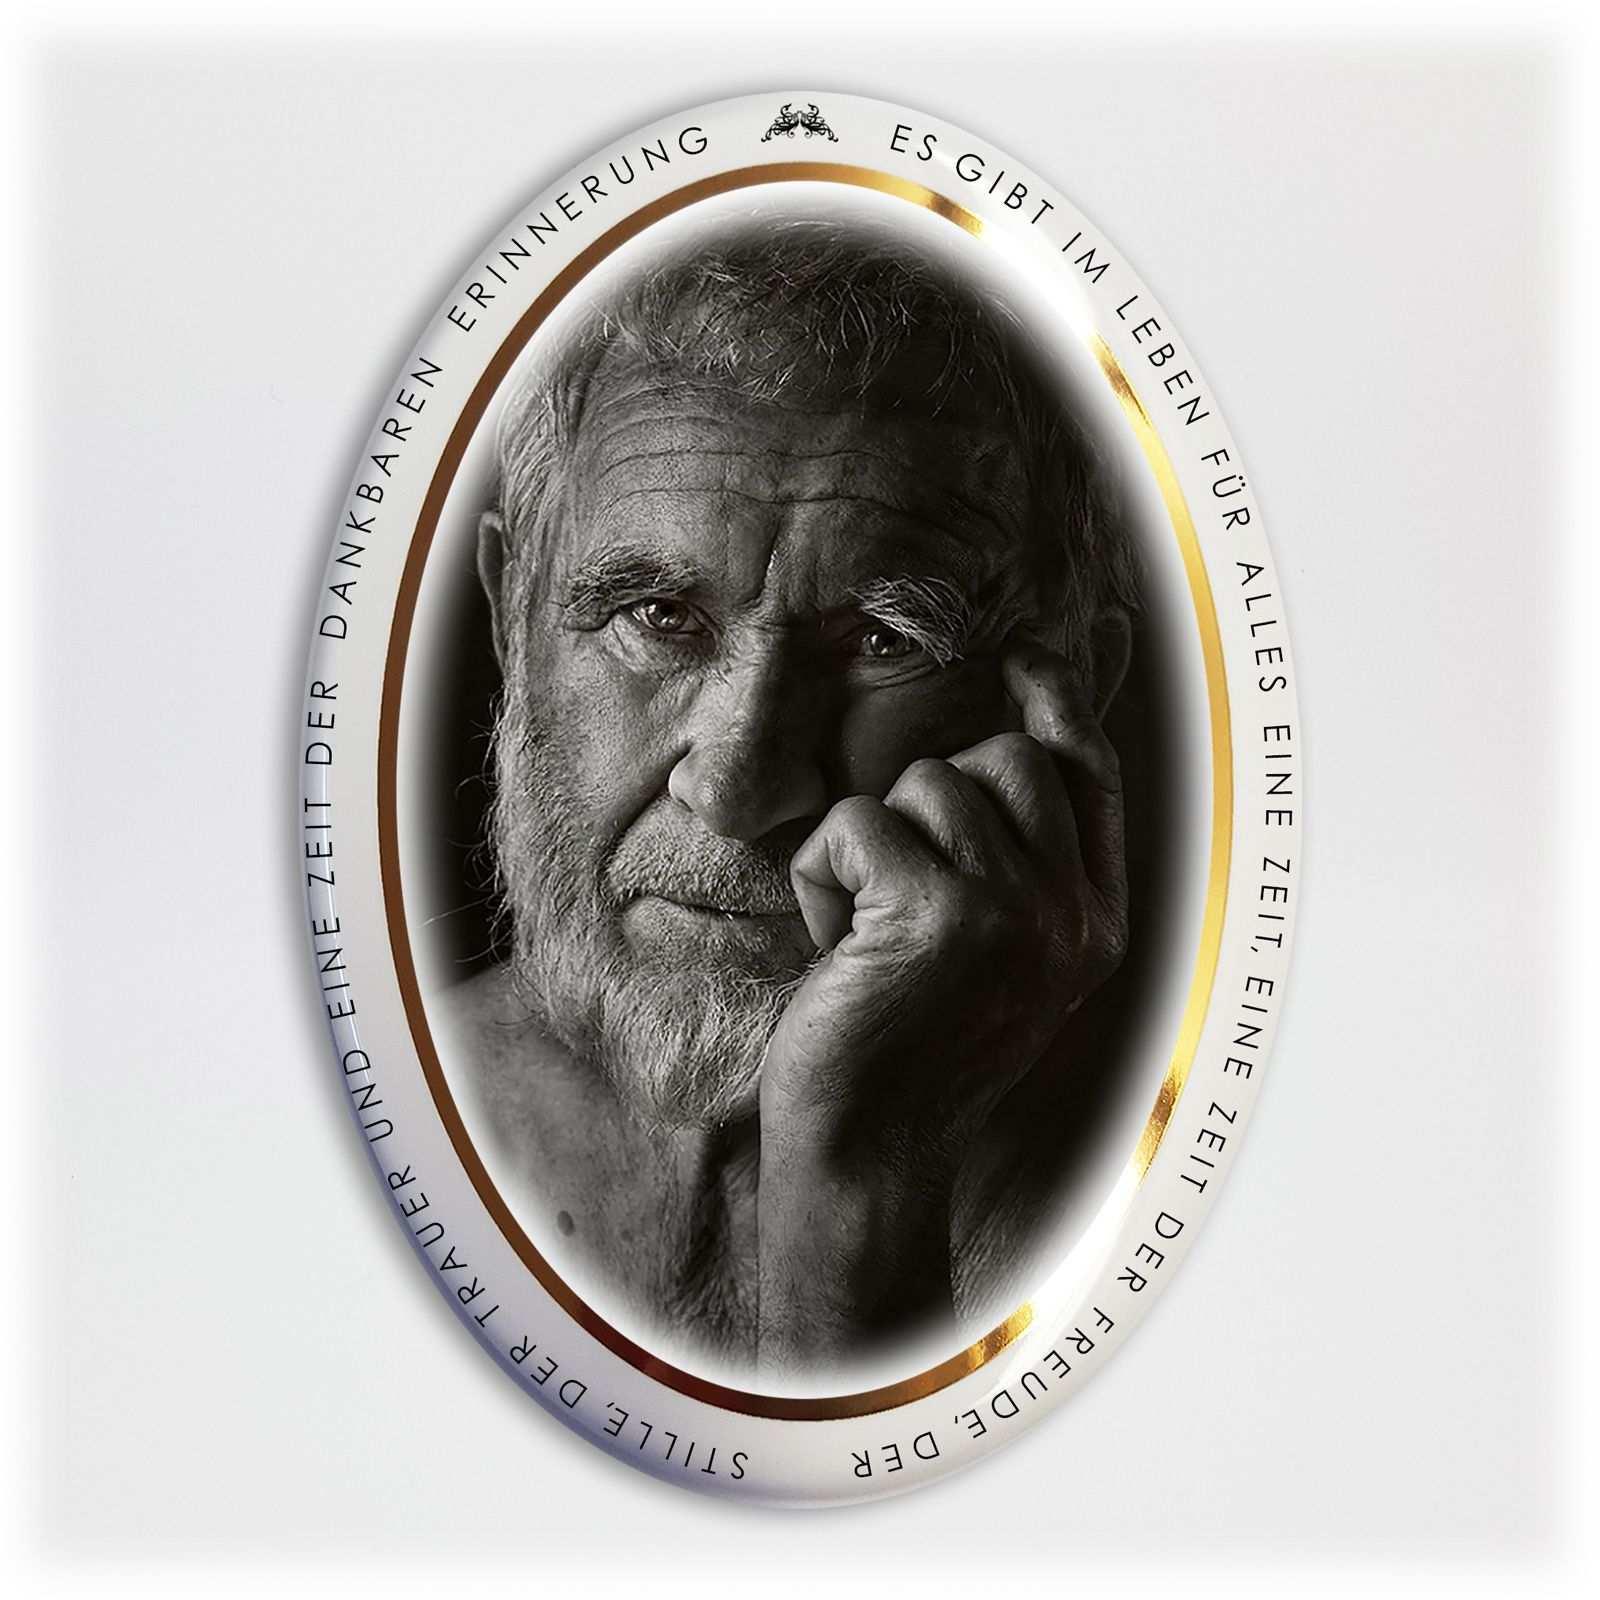 Porzellanbild Mit Dem Goldrand Und Beschriftung Muster Bilder Bilder Porzellan